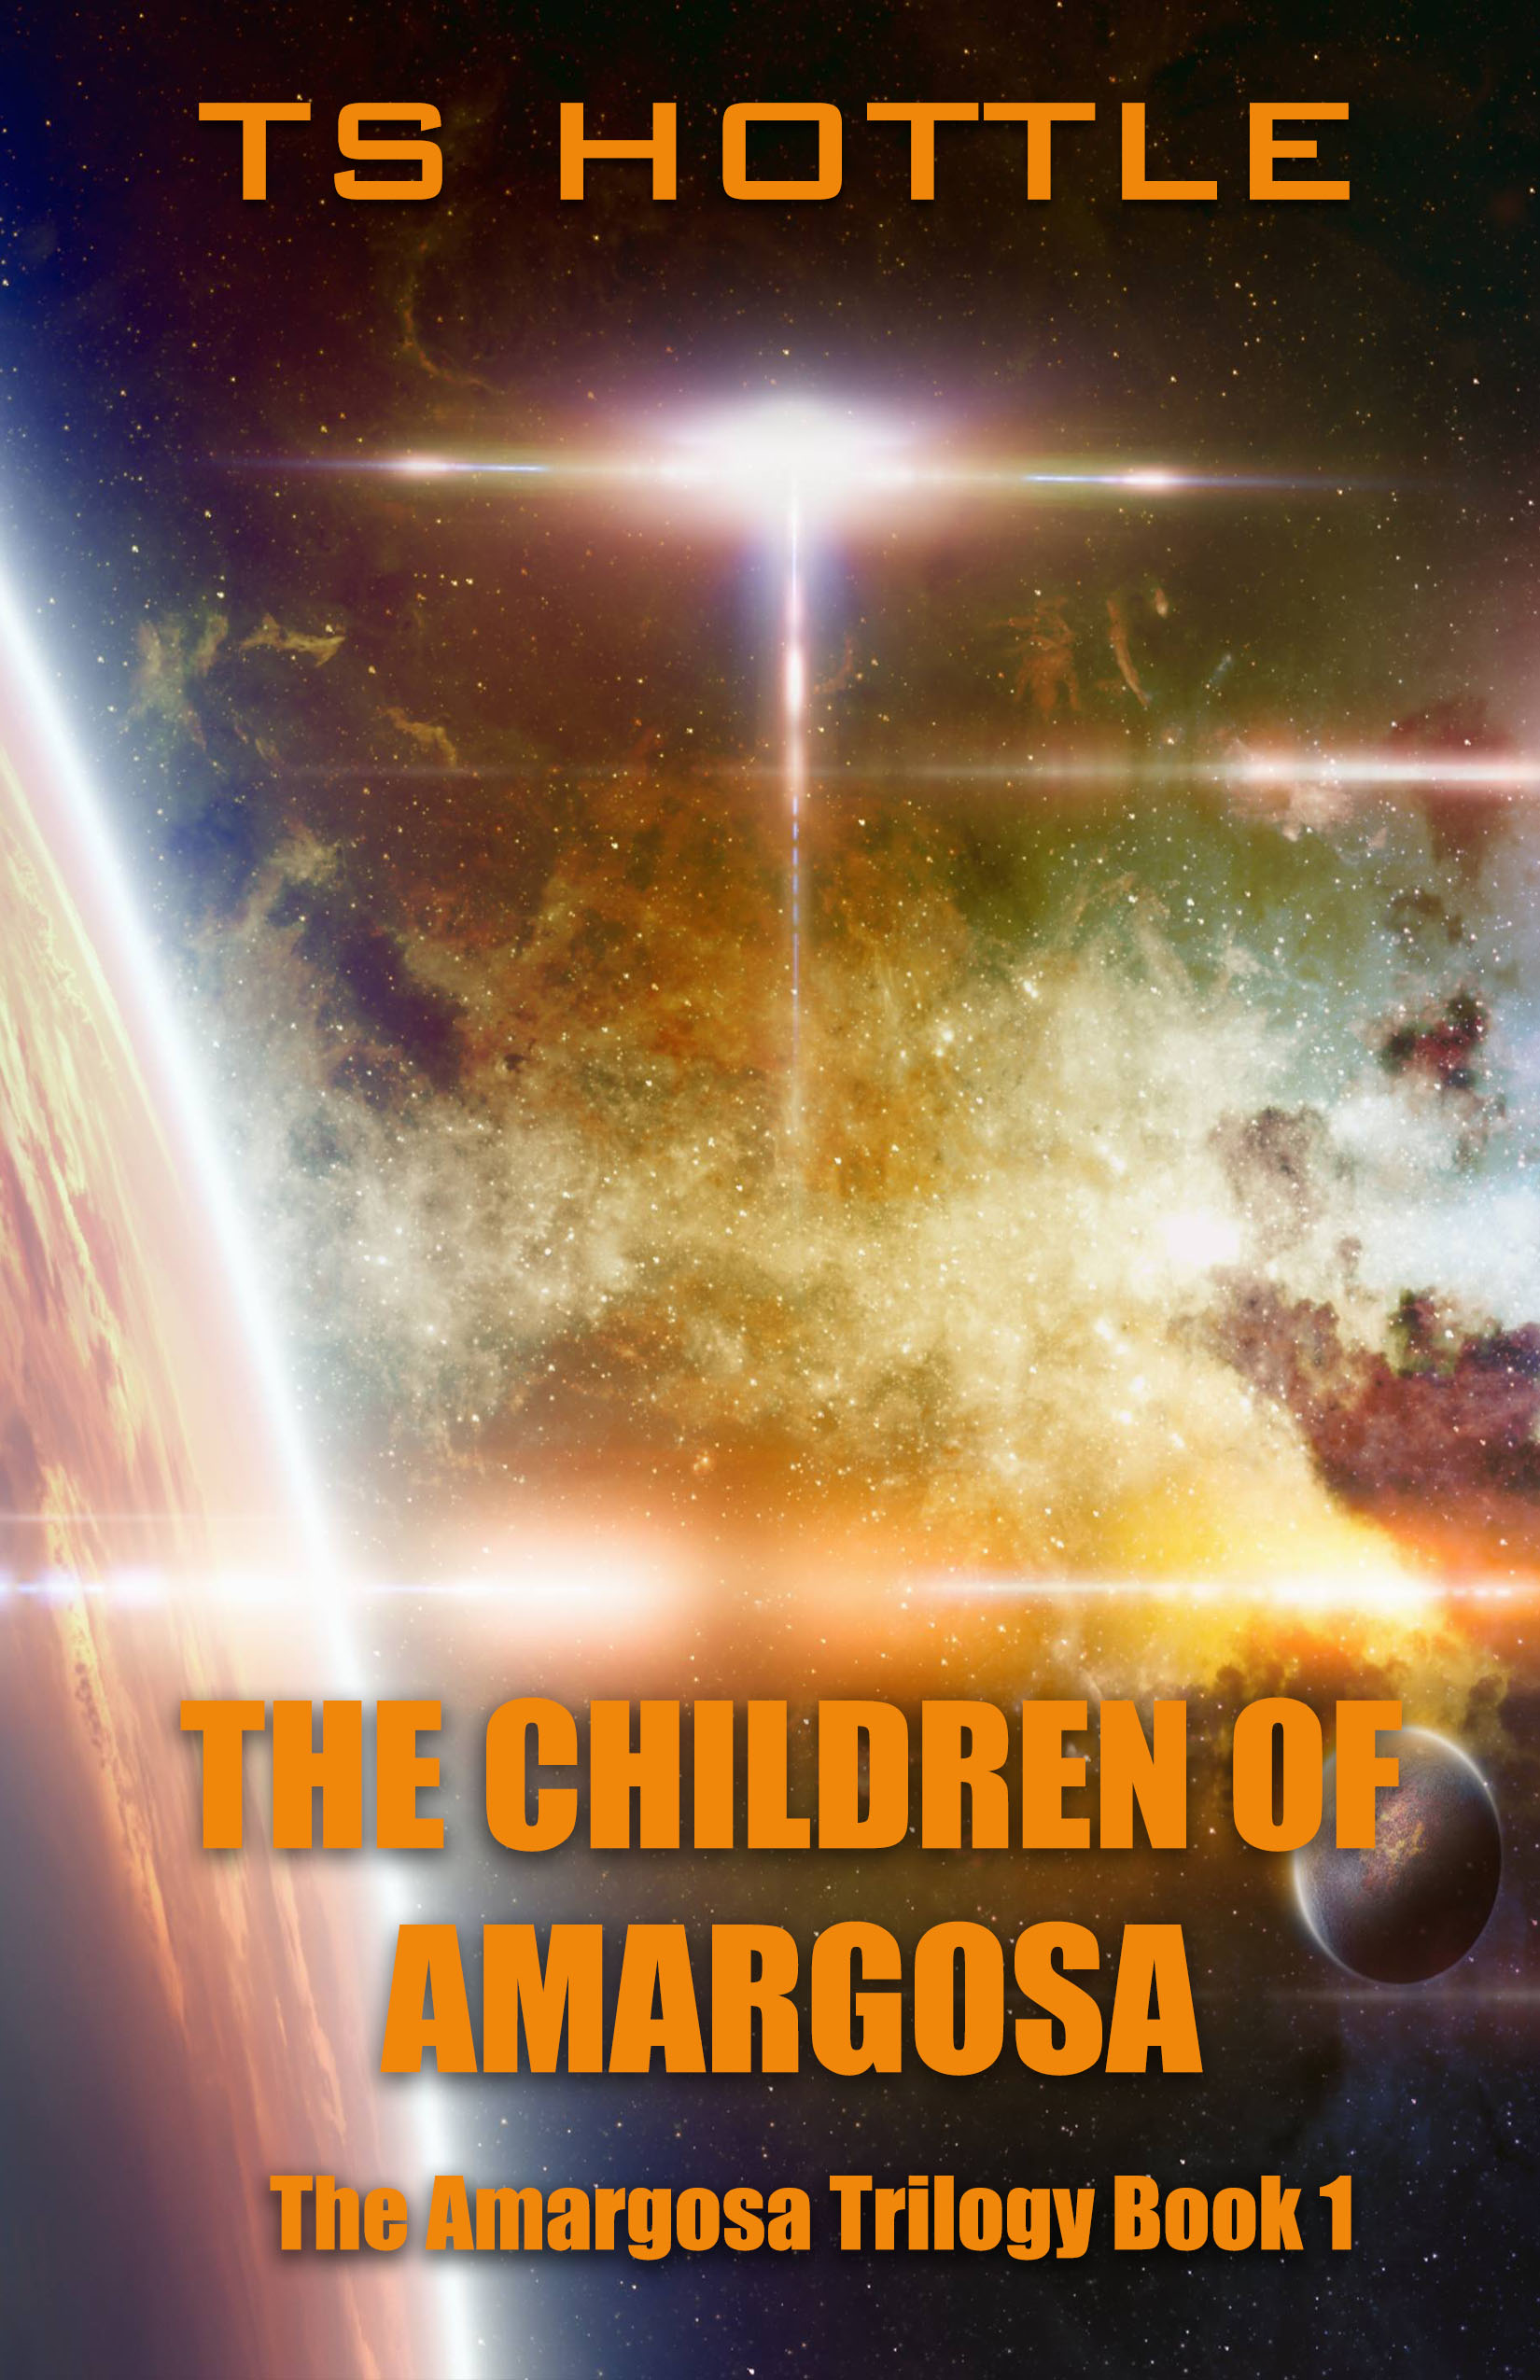 The Children of Amargosa by TS Hottle